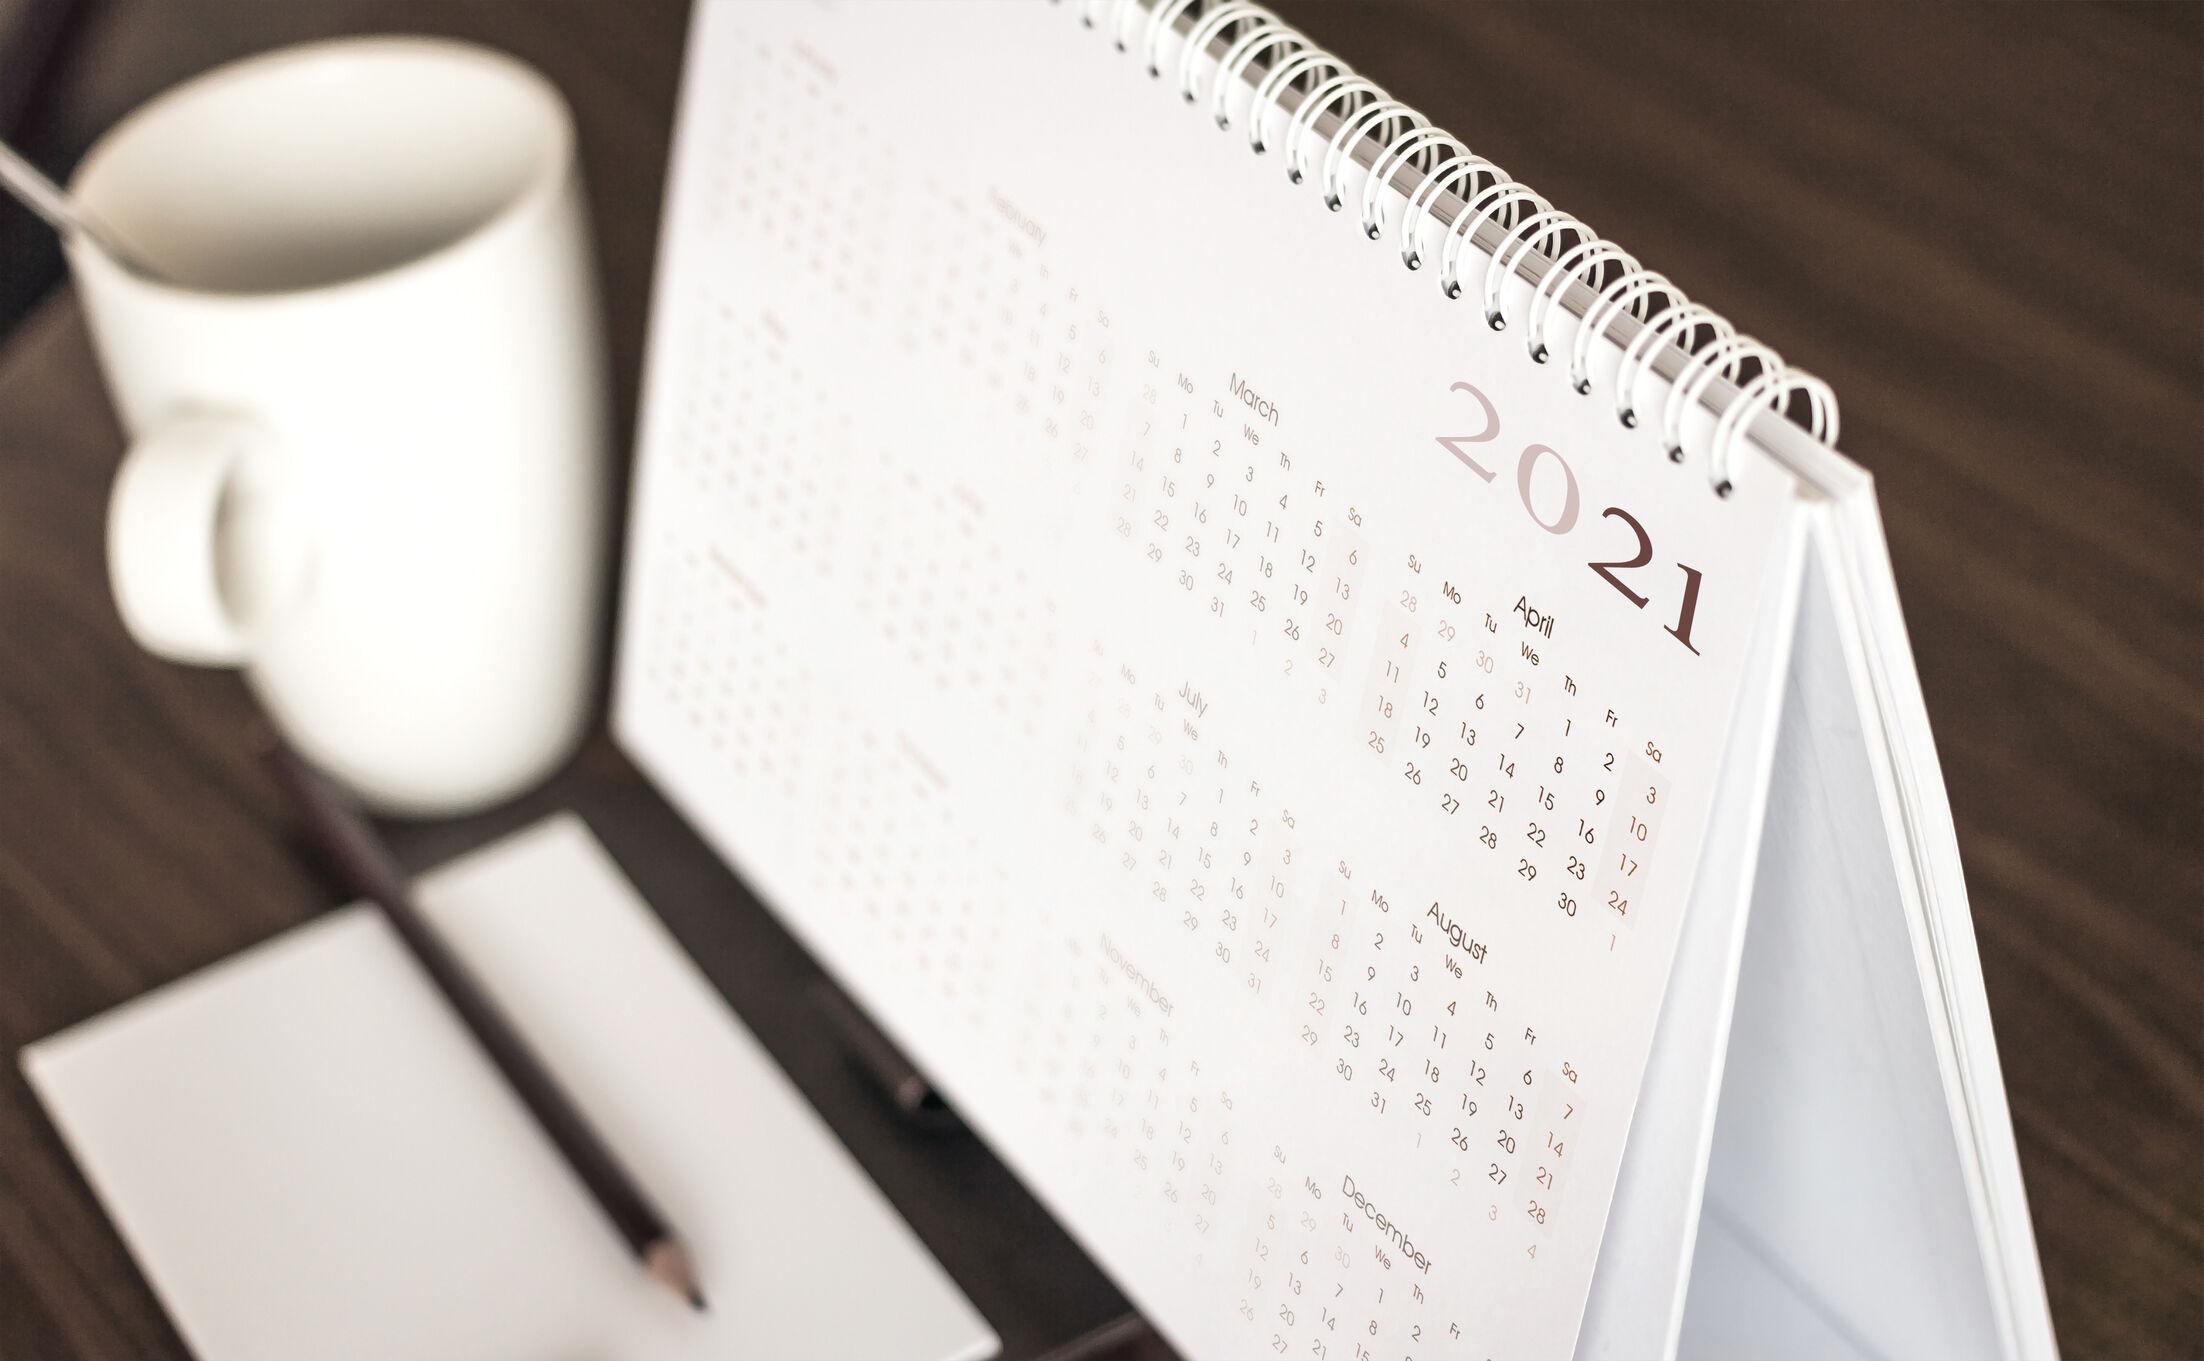 Loudoun County weighs adding diverse holidays to school calendar